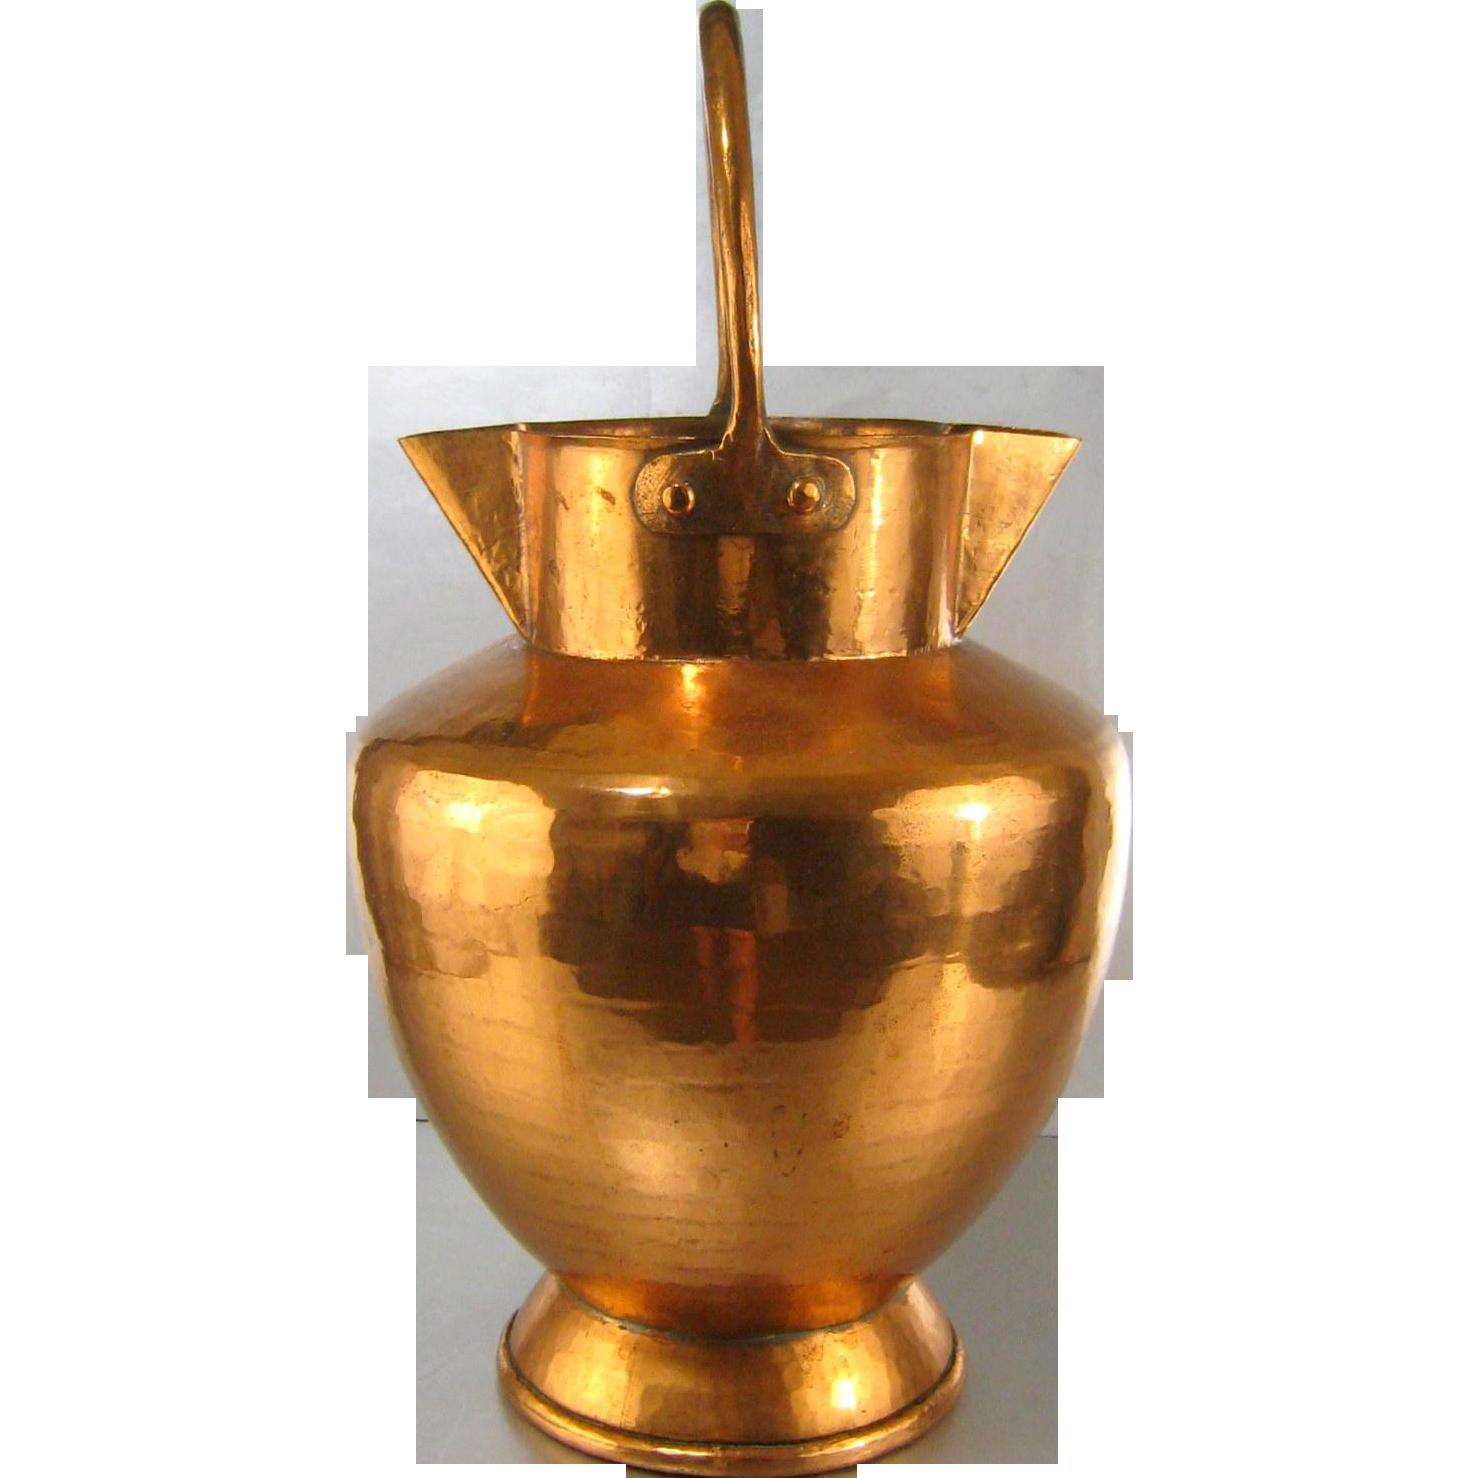 French Copper Milk Jug 19thC Large Antique Hammered